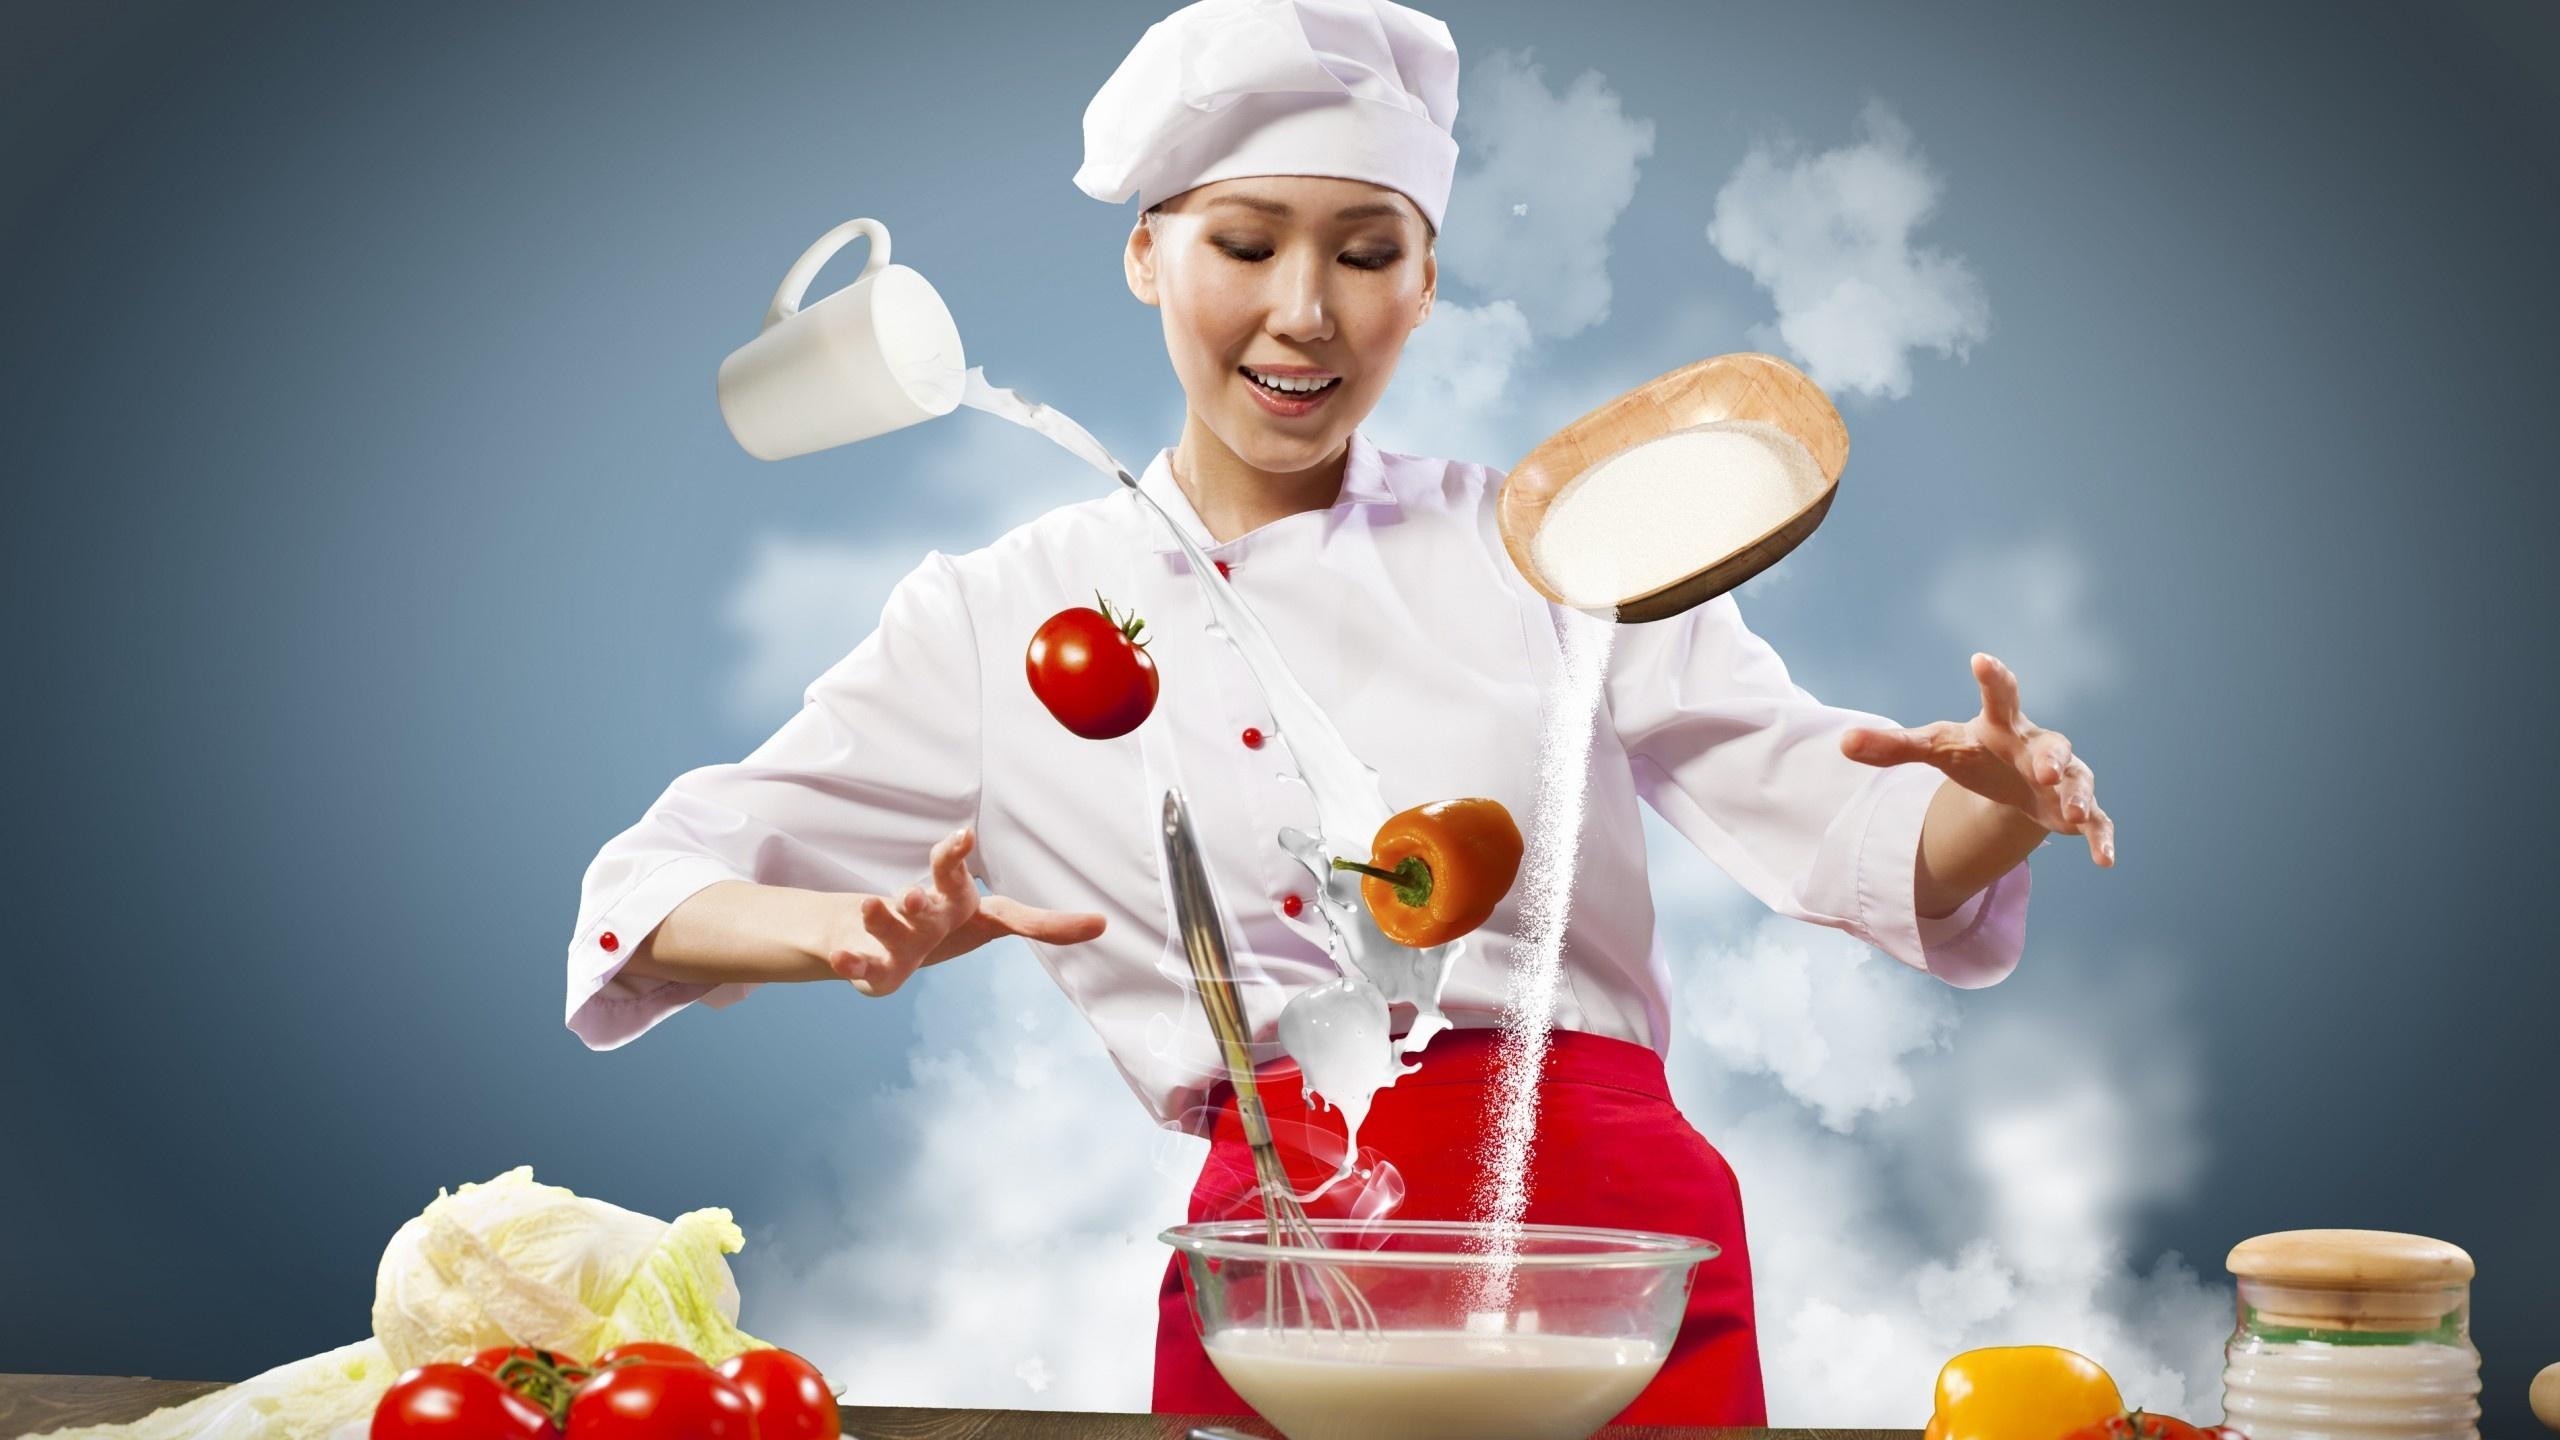 39706975-chef-wallpapers.jpg